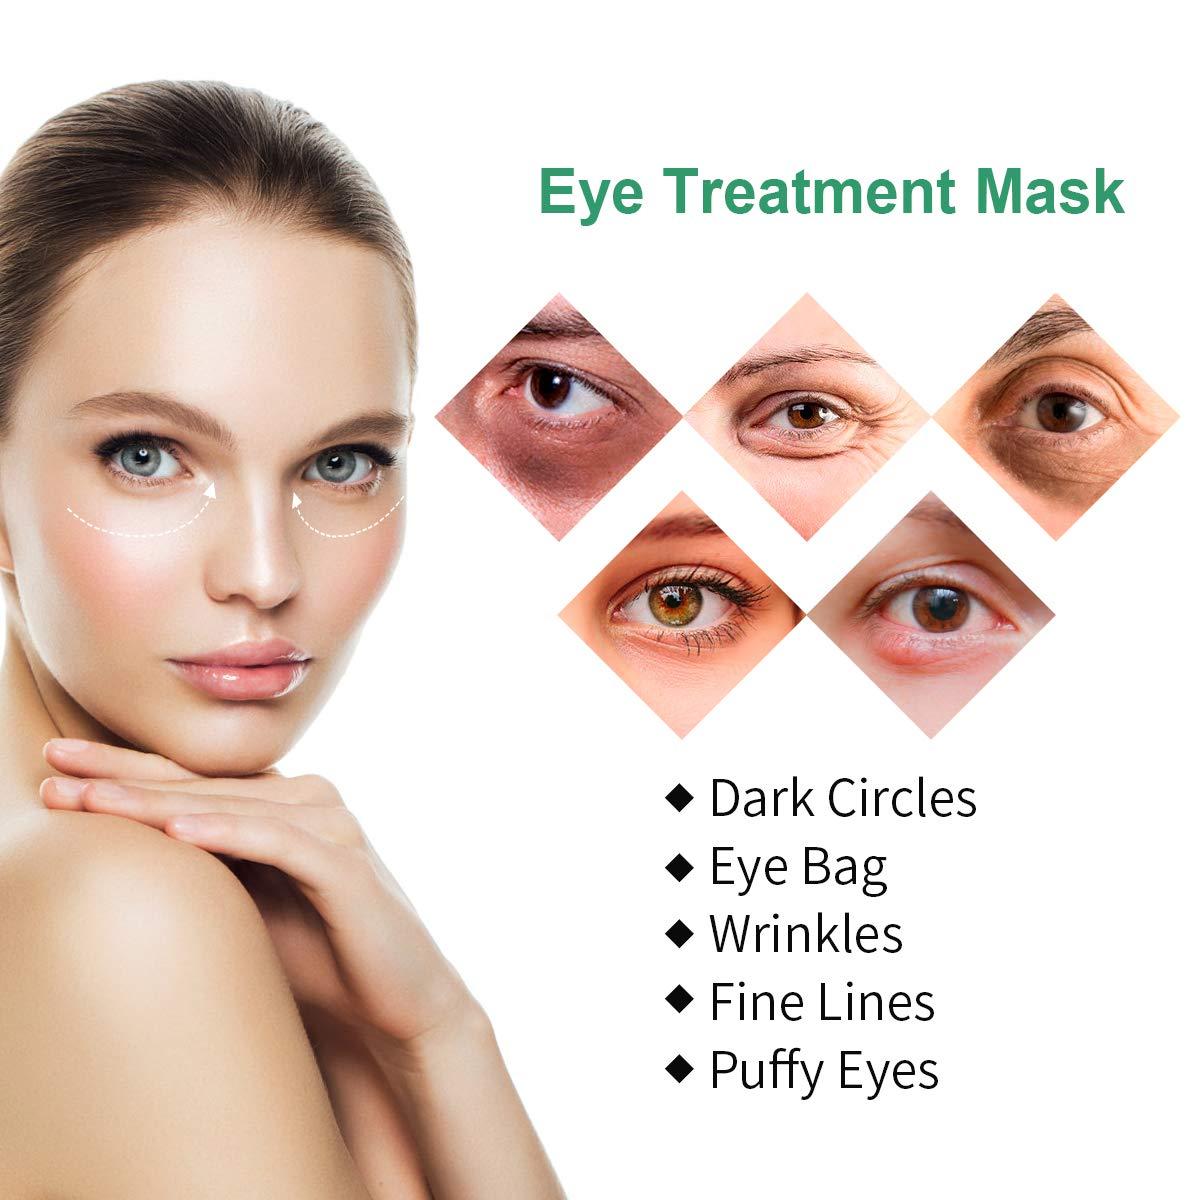 Under Eye Patches, Collagen Under Eye Pads 30 Pairs Anti Aging Tea Gel Eye Treatment Mask for Women Men Energizing Moisturising Hydrating Eye Bags Dark Circles Wrinkles Under Eye Mask